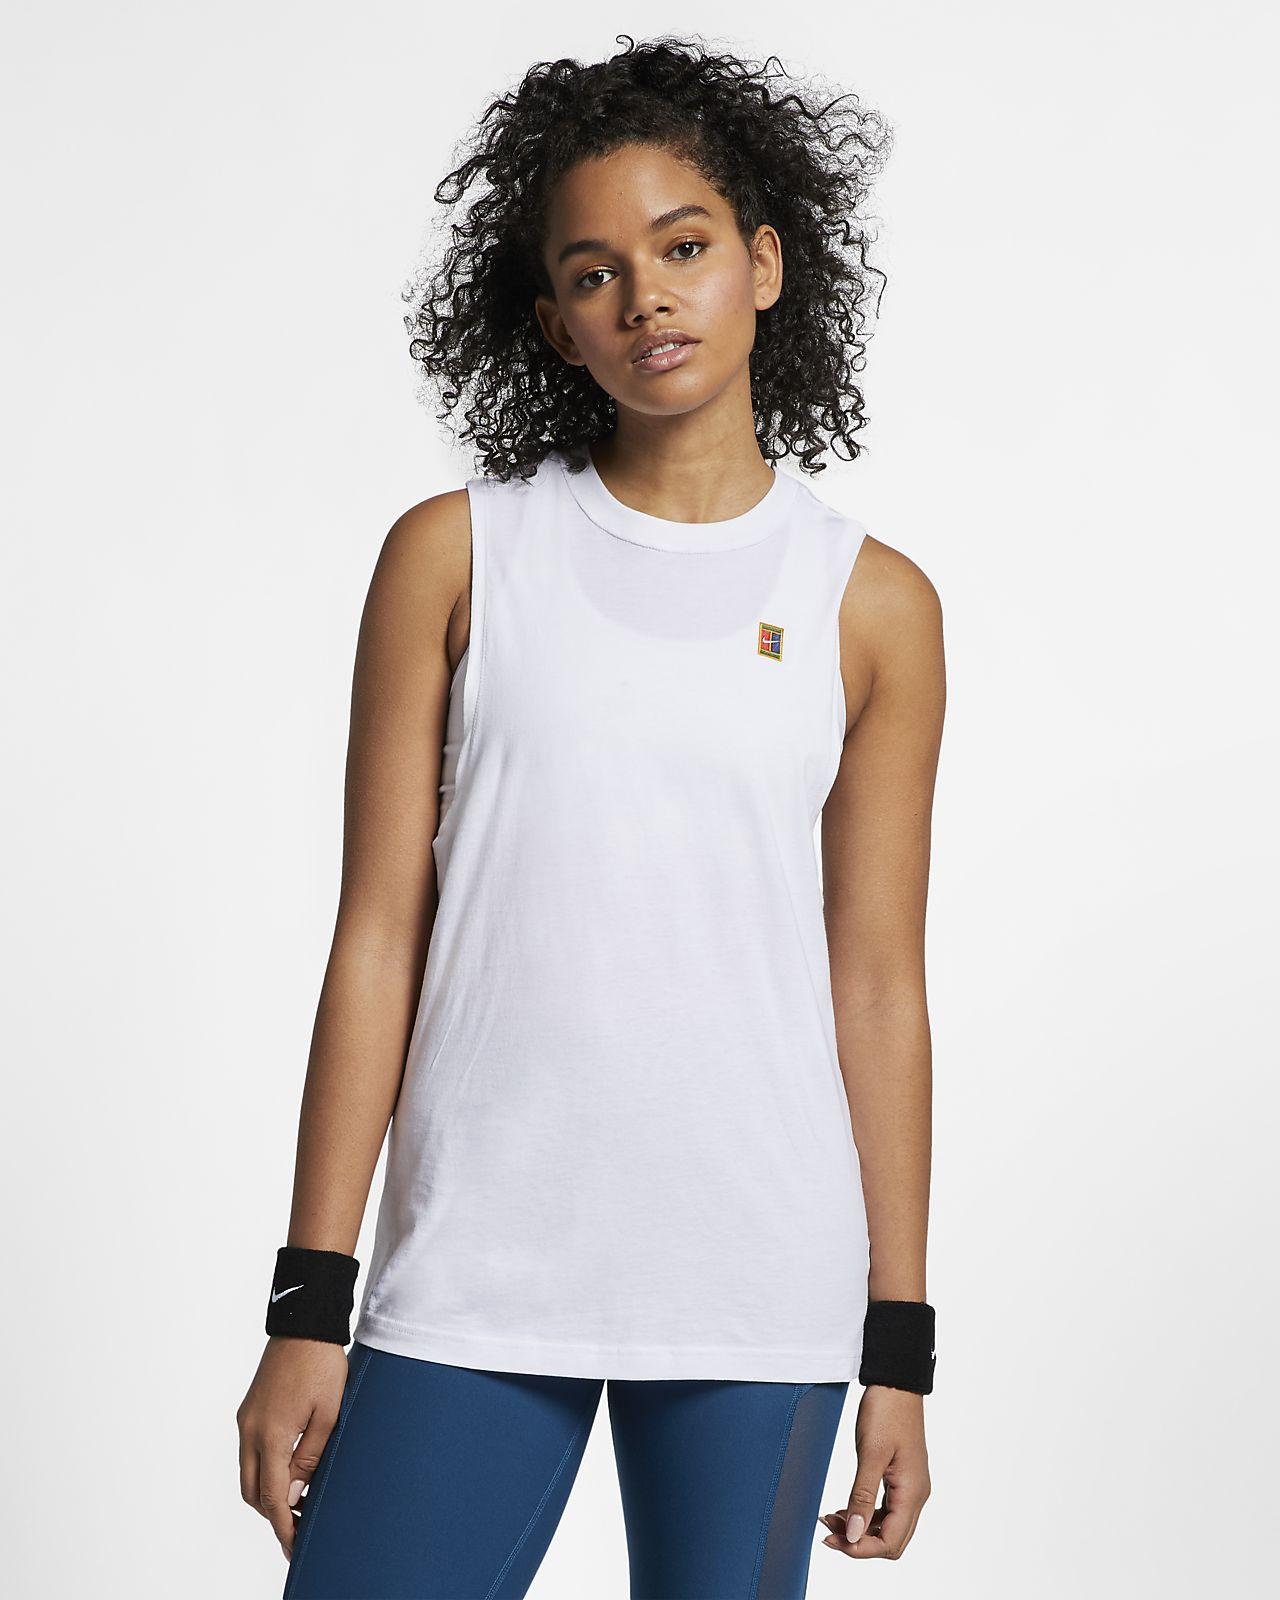 Camisola de ténis sem mangas NikeCourt para mulher